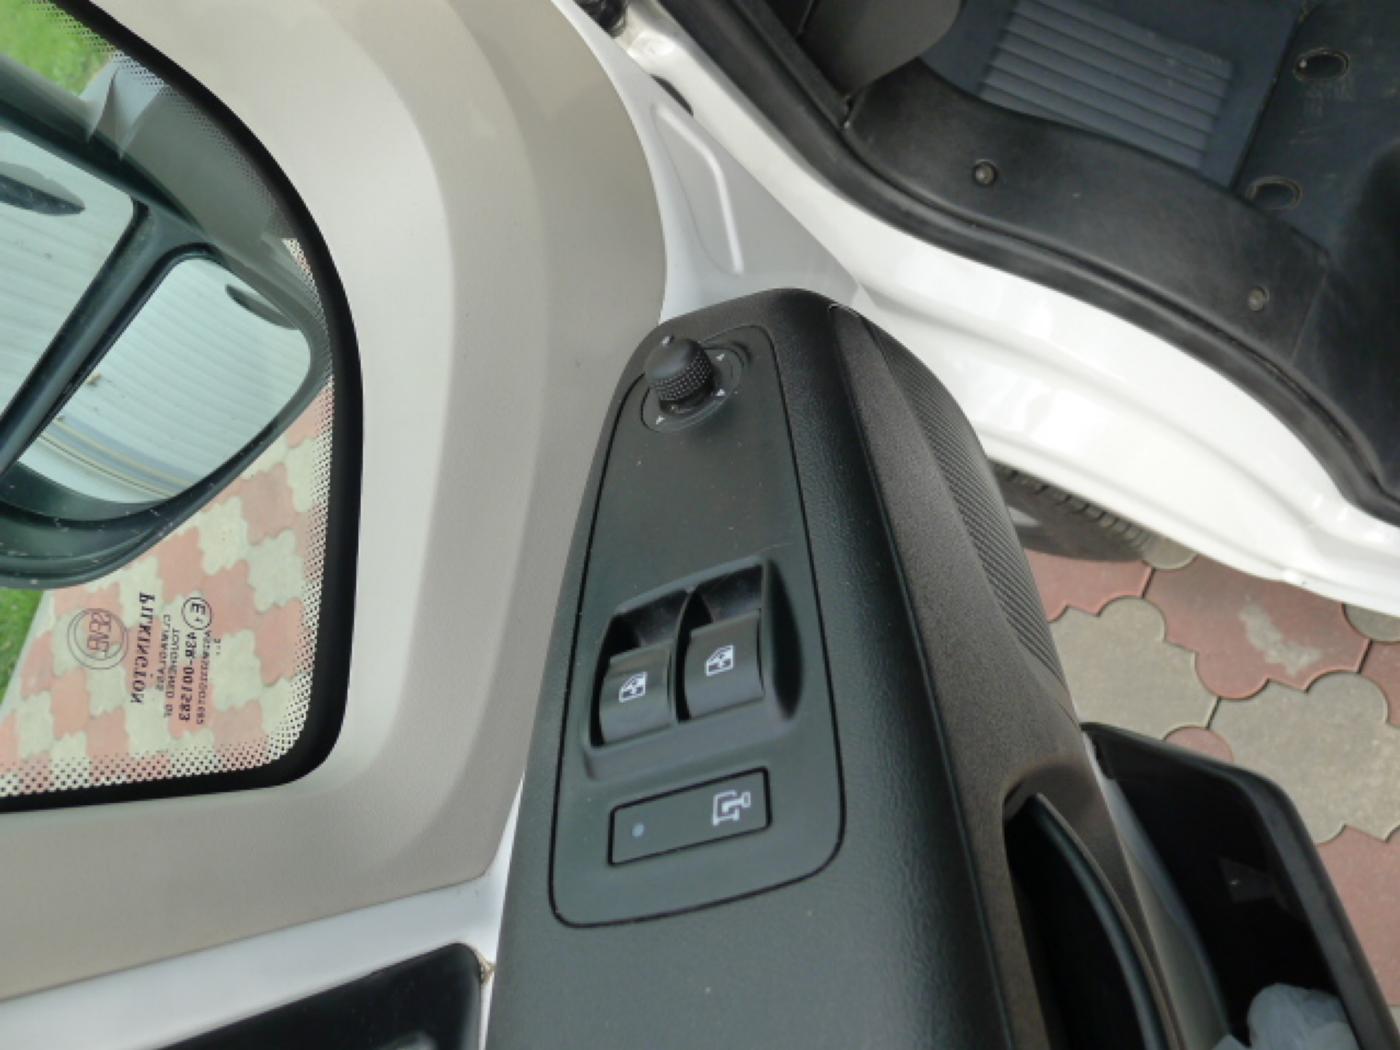 Peugeot Boxer 2.2 HDI L1H1 Klima Akce!!! Novinka - 13